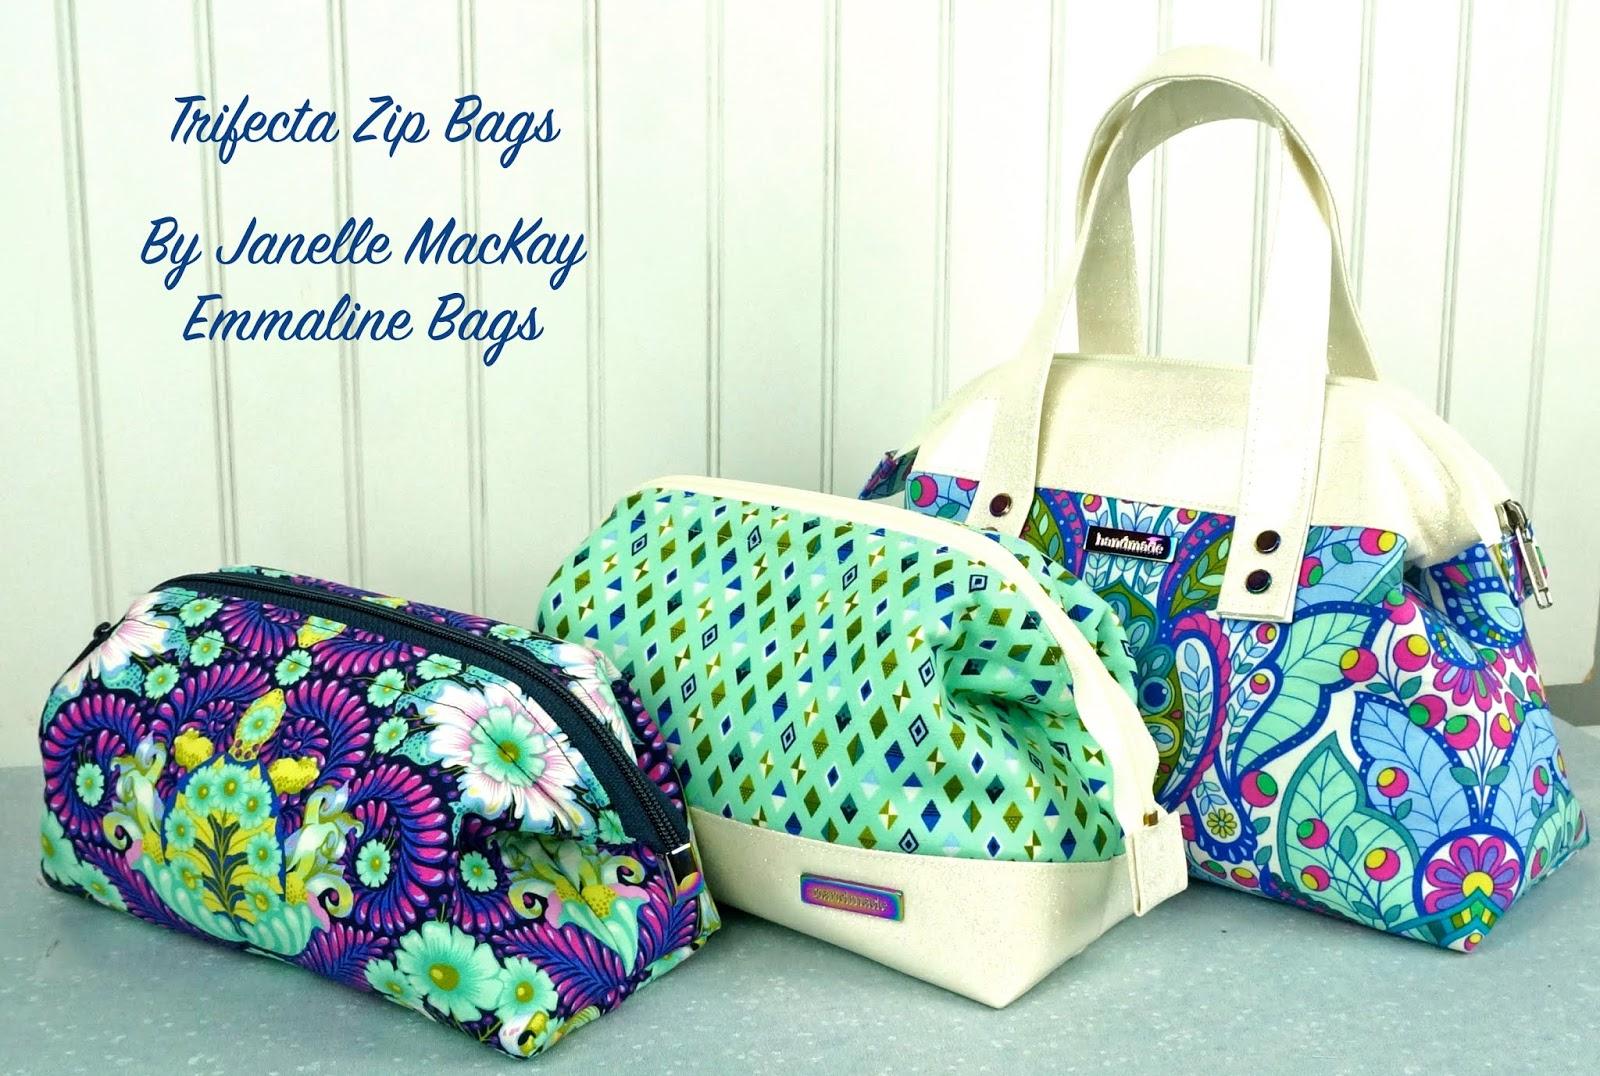 b7c5efa70187 Emmaline Bags  Sewing Patterns and Purse Supplies  Trifecta Zip Bags ...